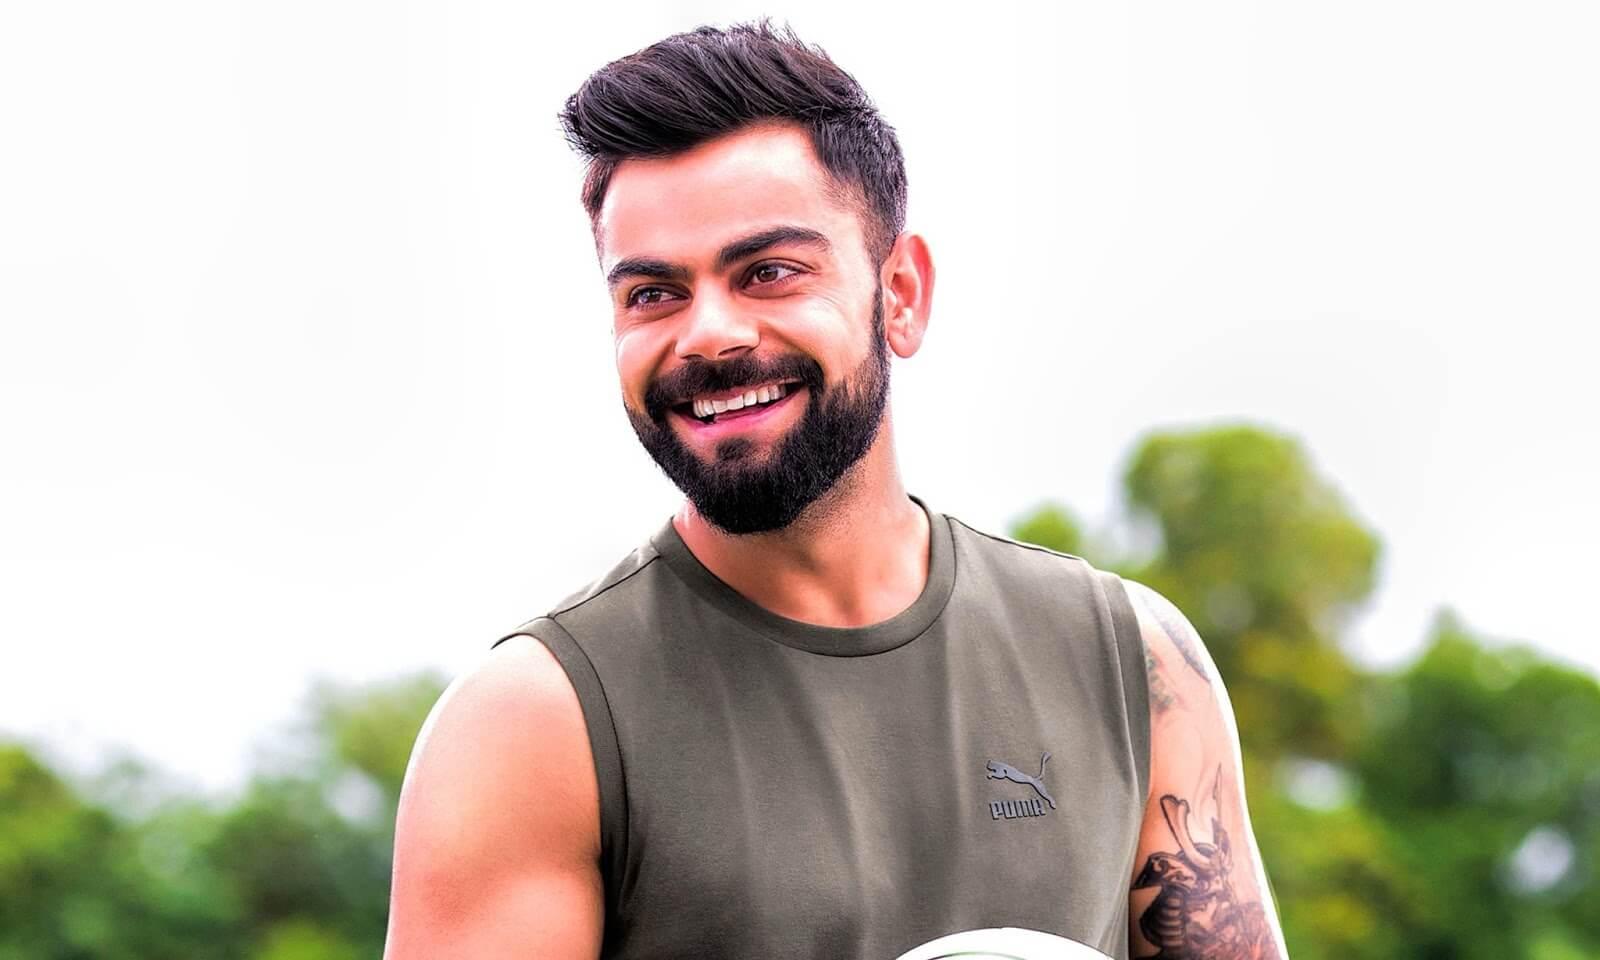 Long Stubble Beard Style – VIrat Kohli